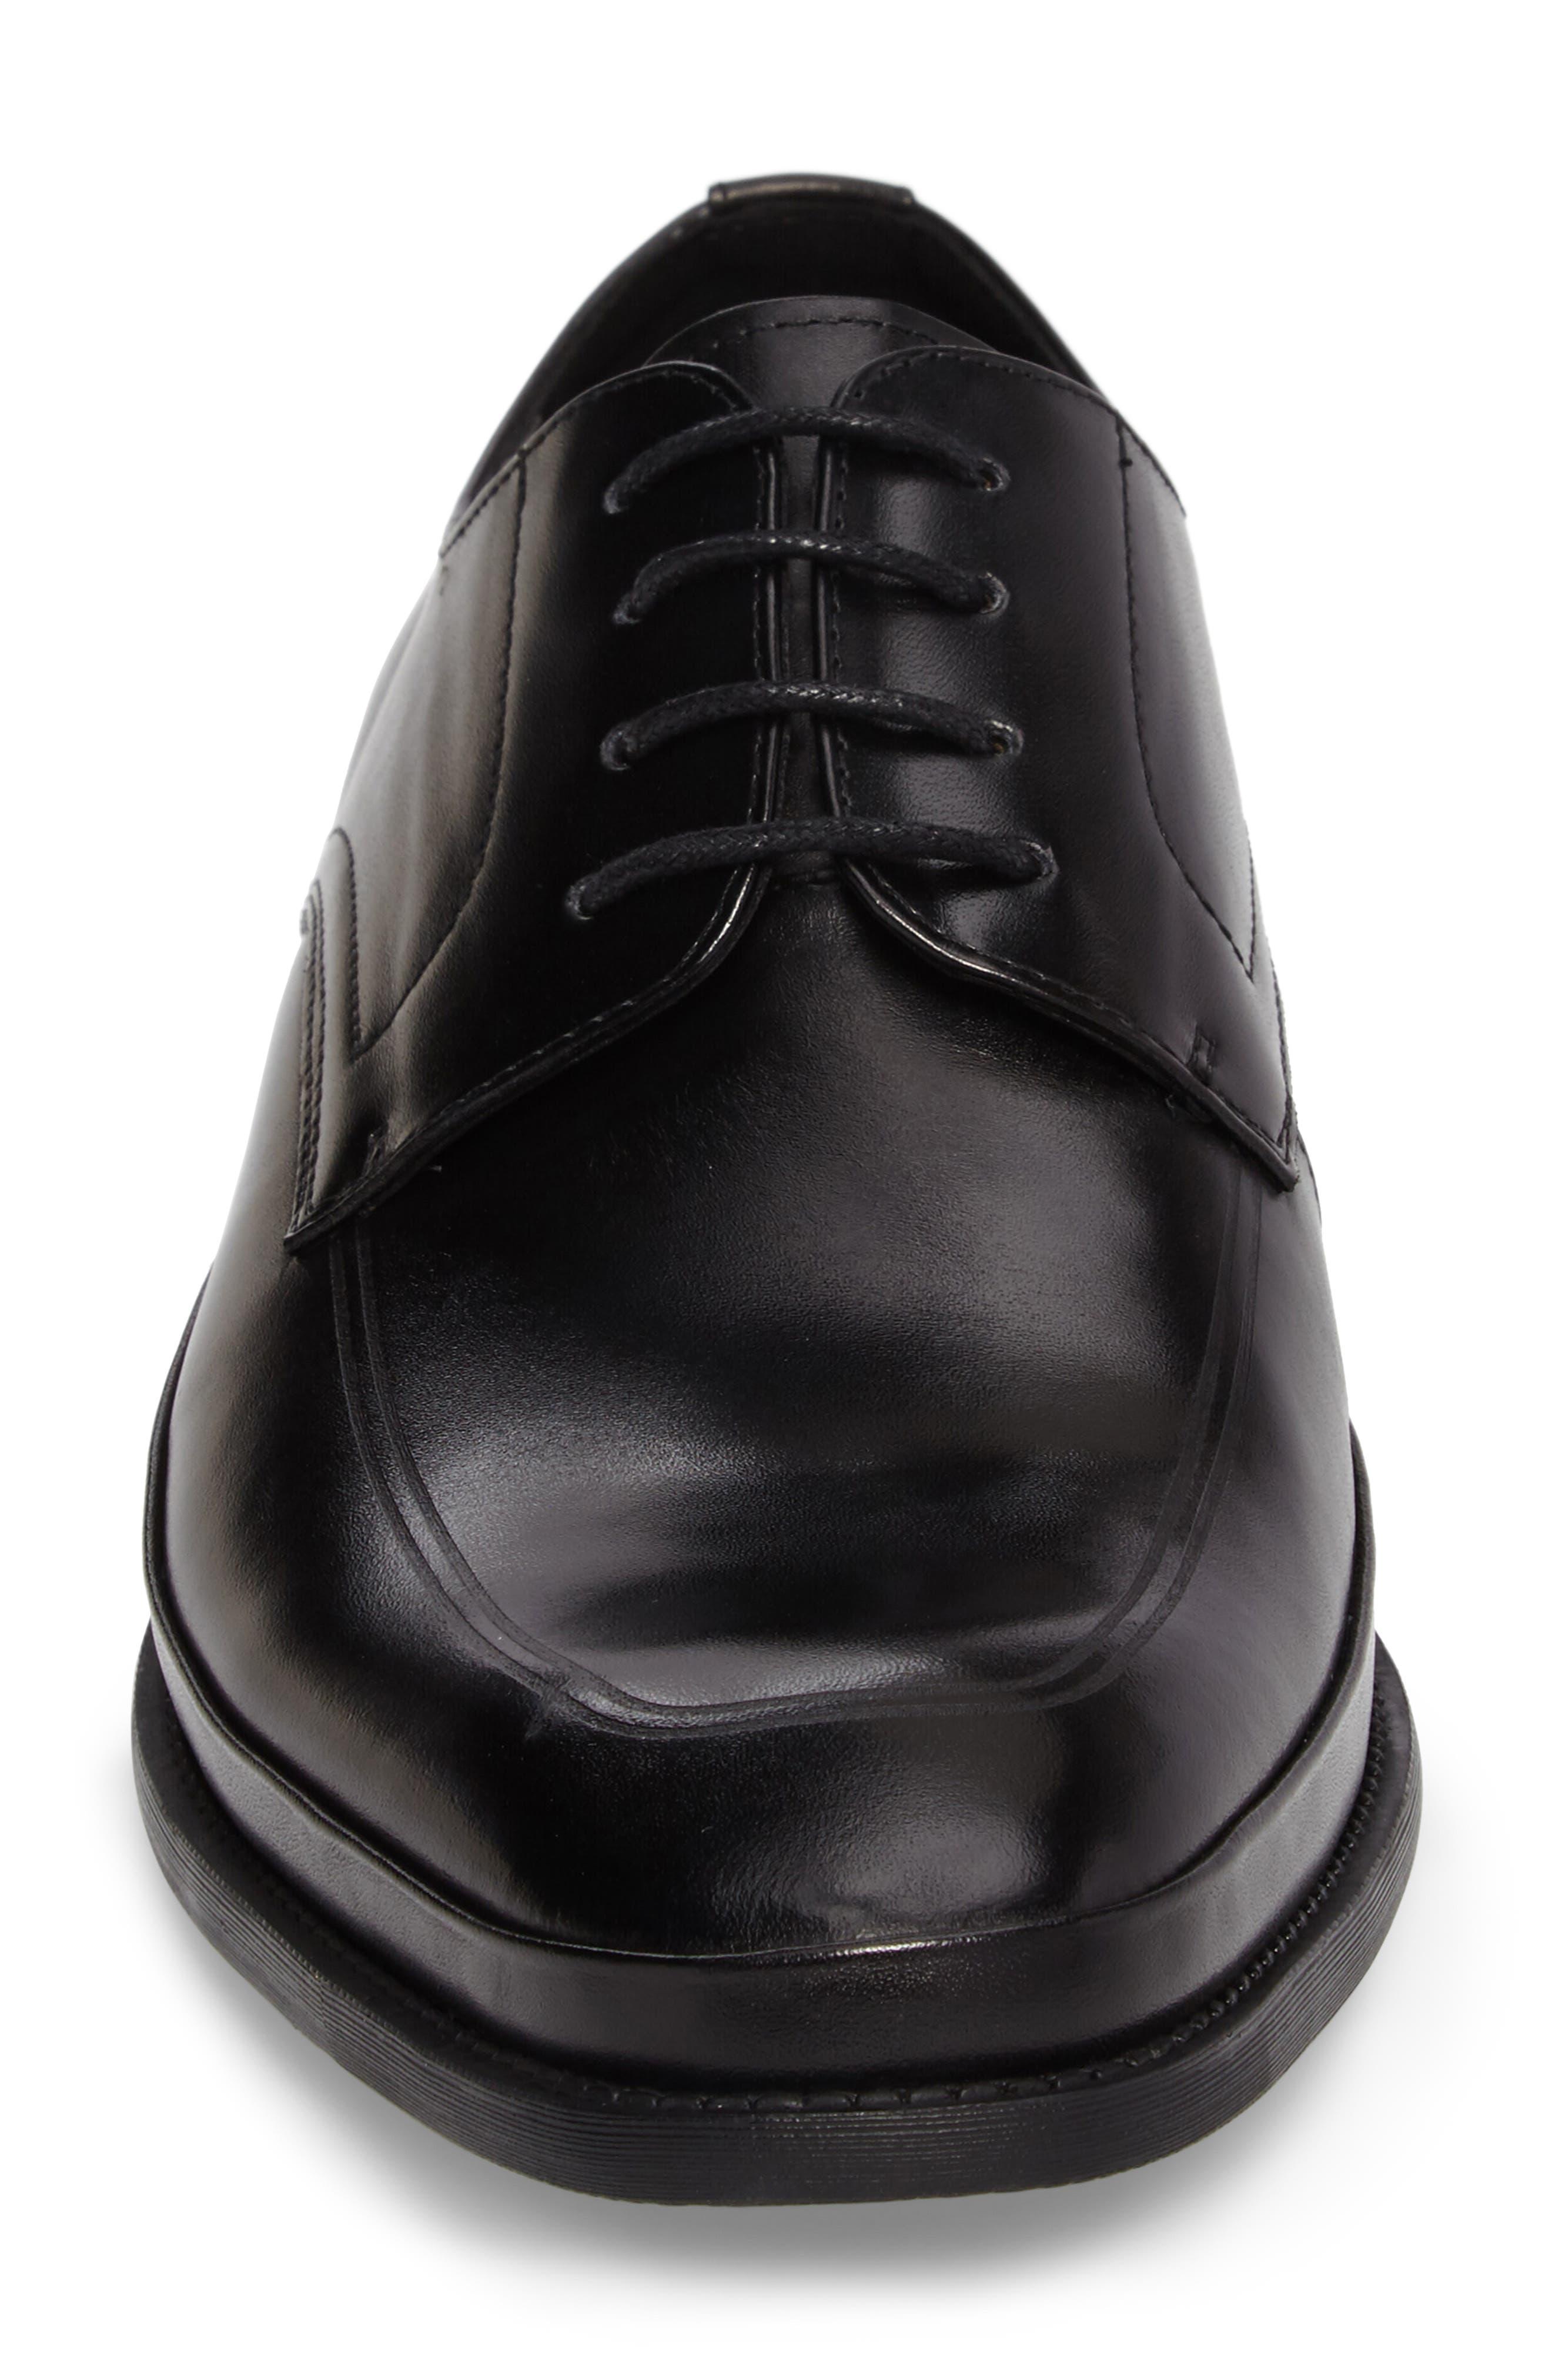 Brick Free Plain Toe Derby,                             Alternate thumbnail 4, color,                             Black Leather